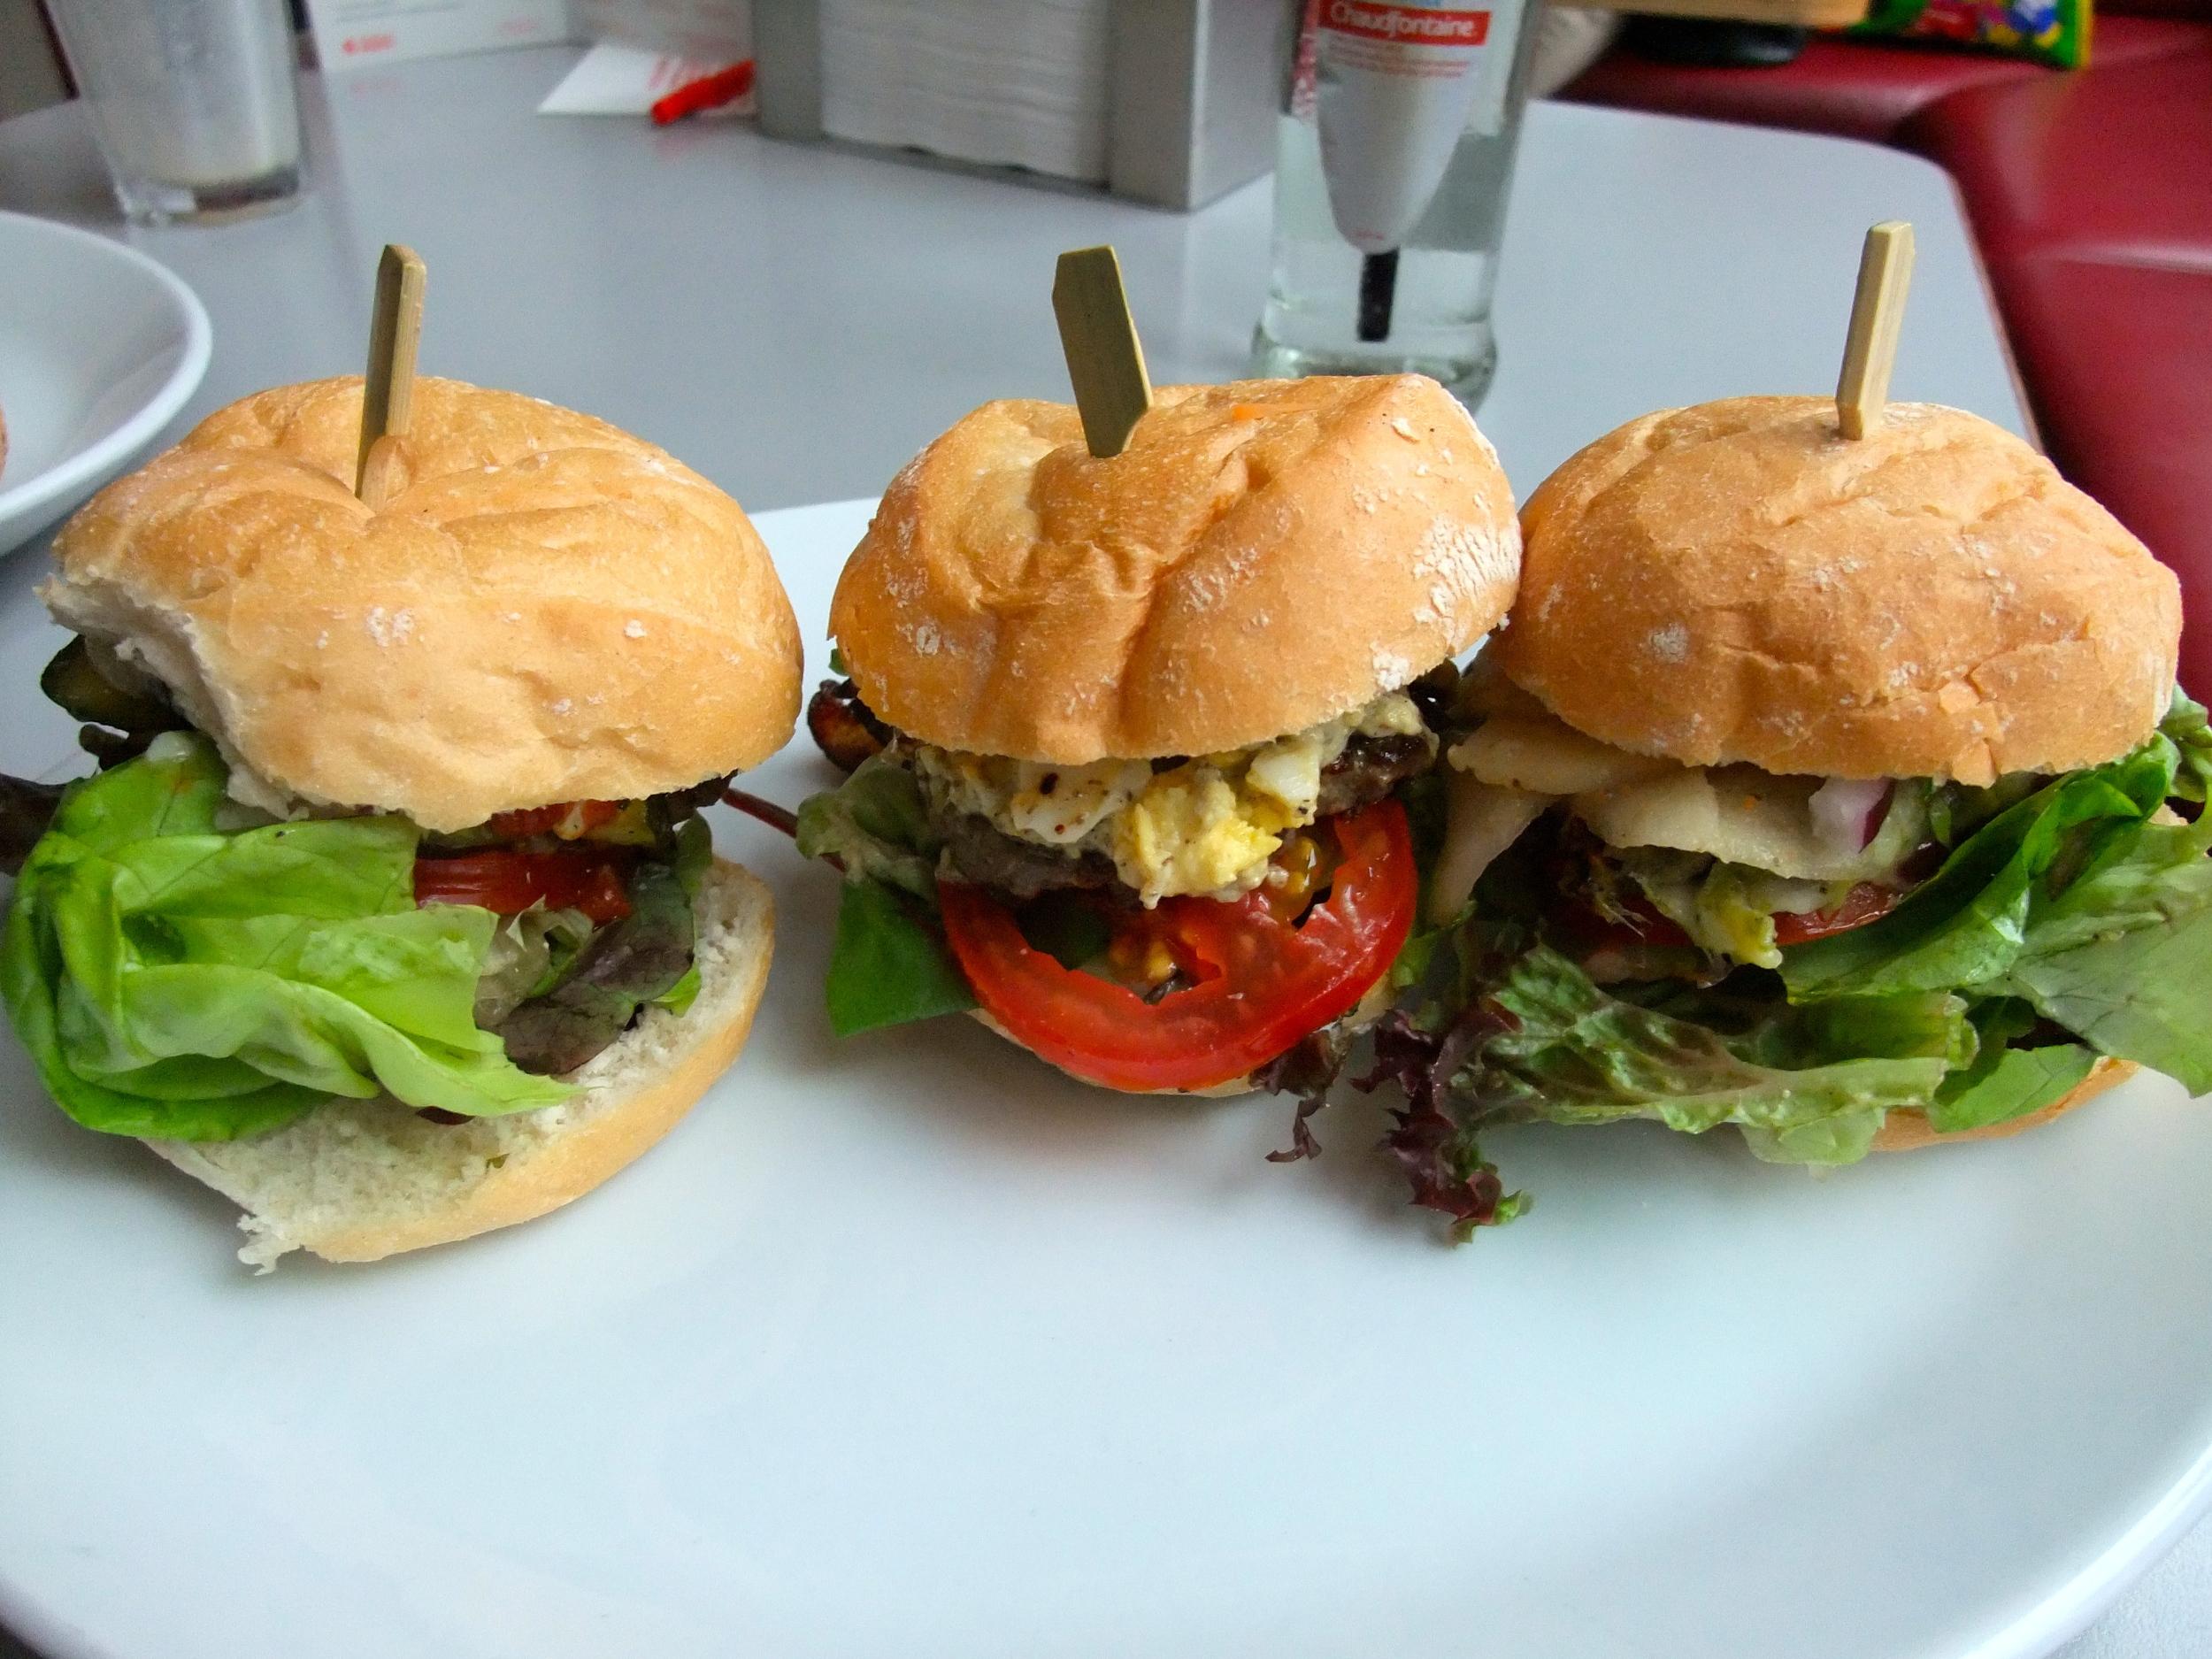 Meester Biefburger, Biefburger Royal, and Manchegoburger